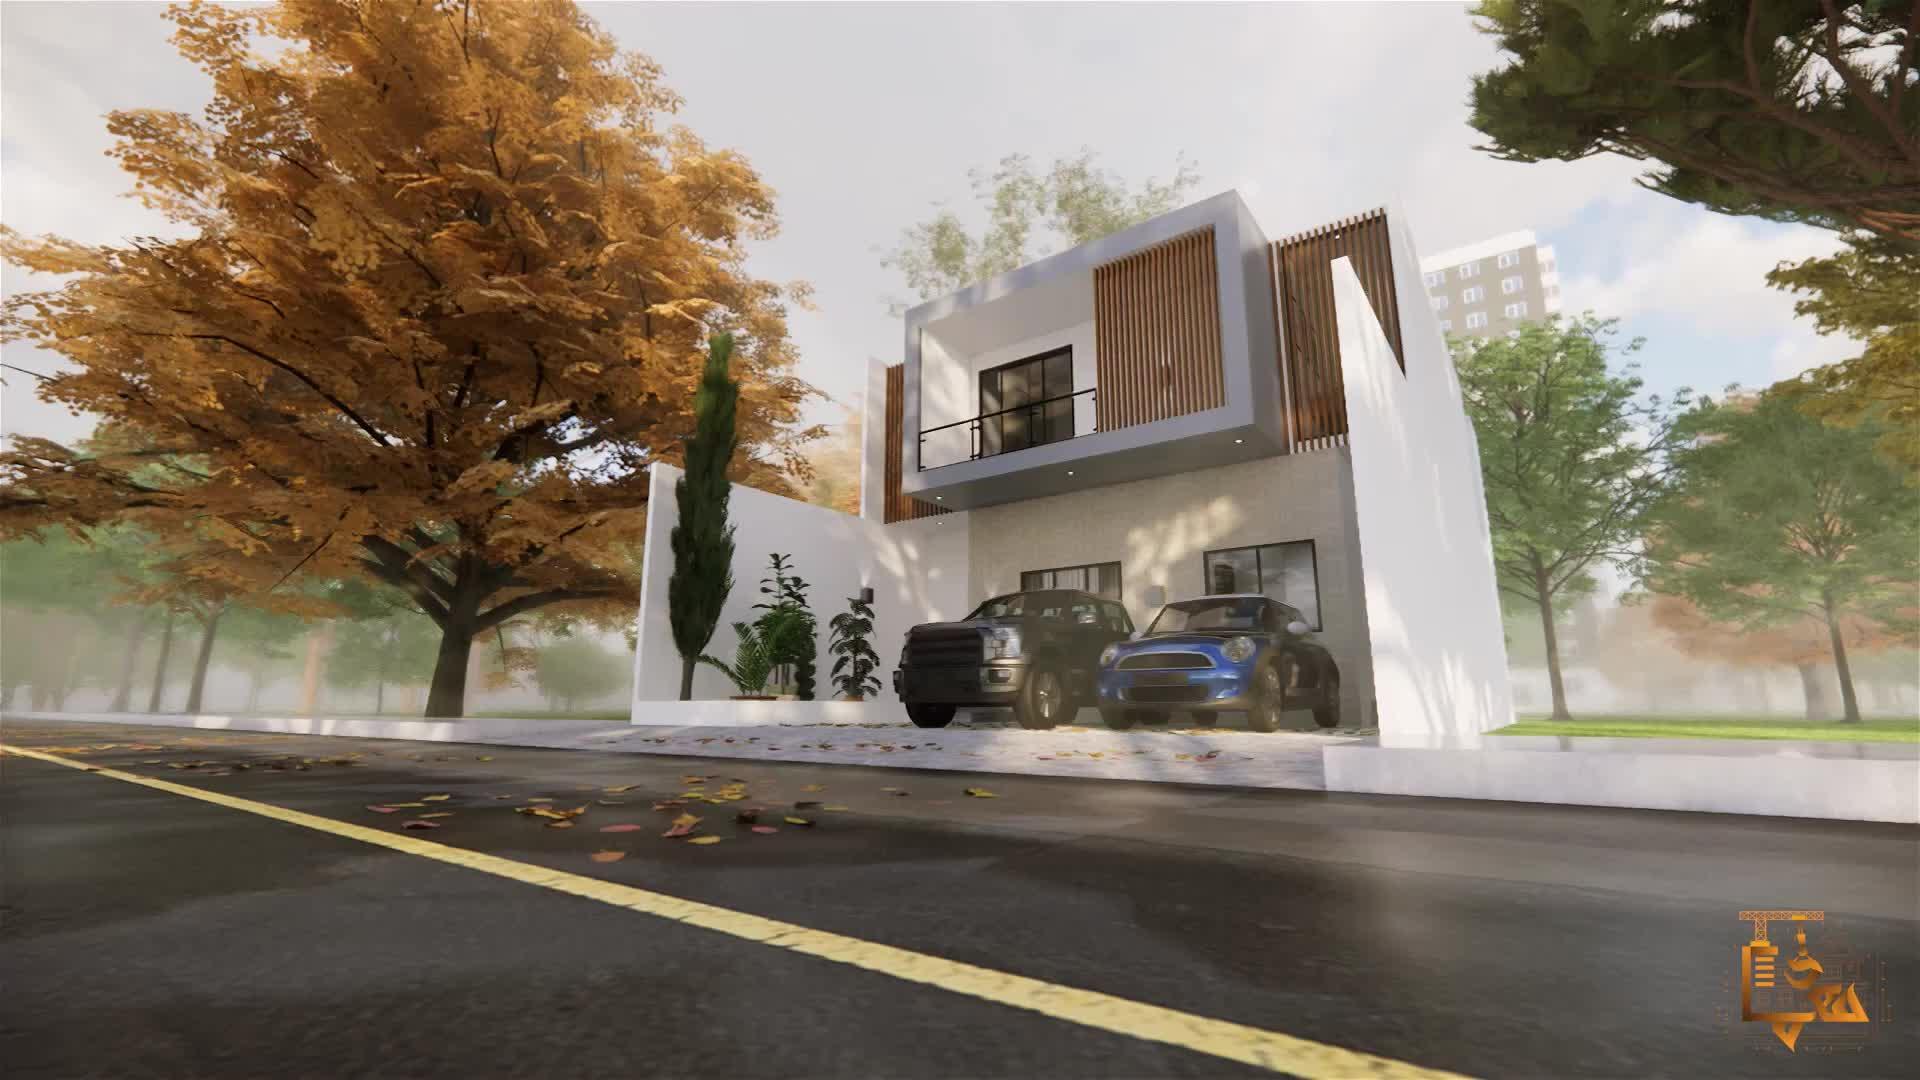 professional-architecture-and-interior-freelancer-image-170304